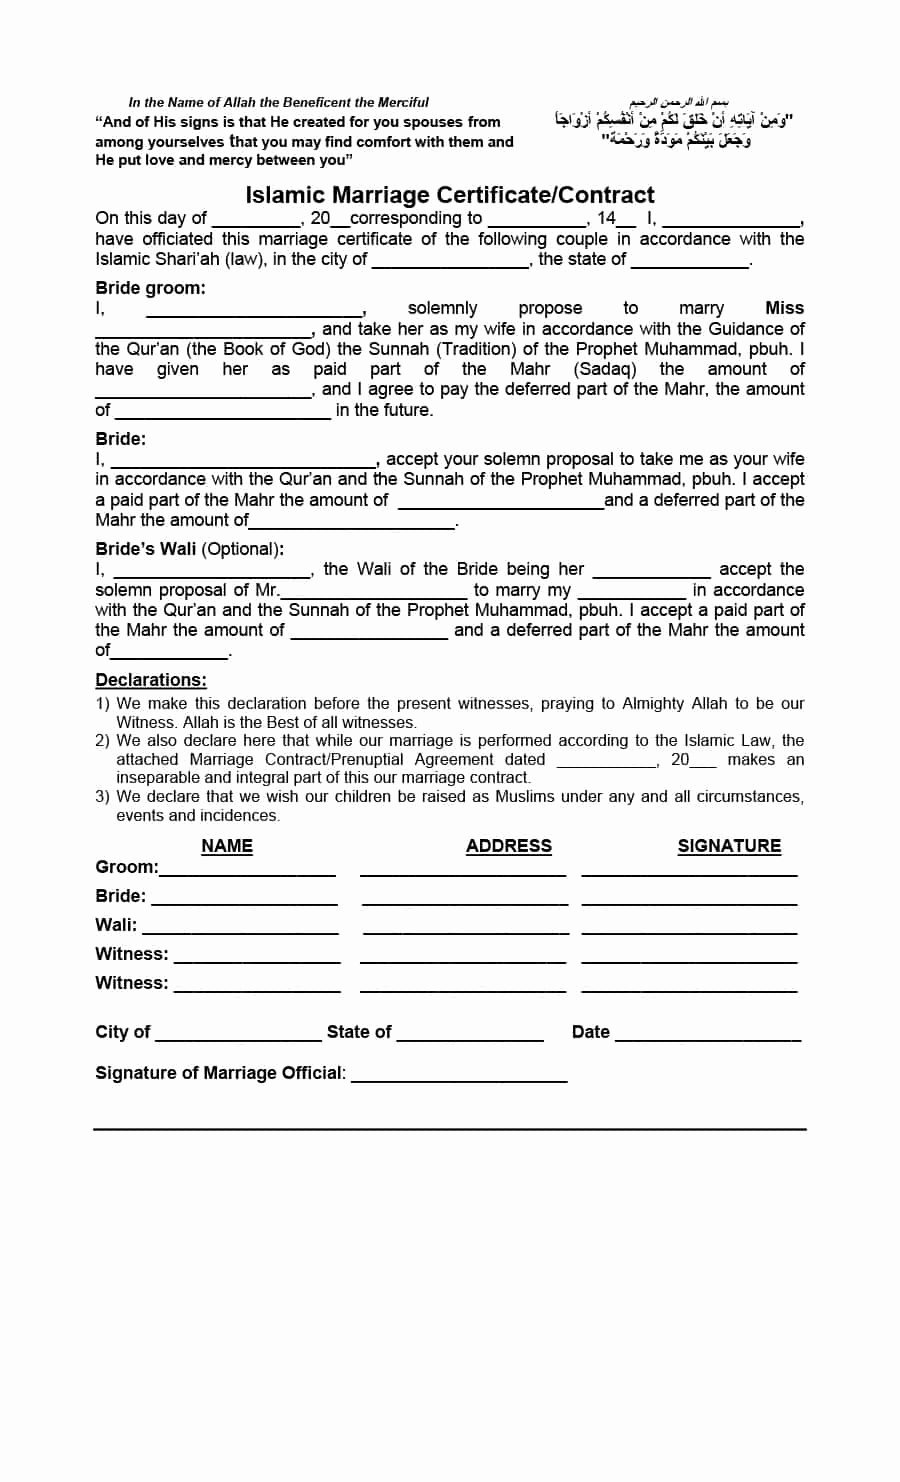 Islamic Marriage Contract Template Beautiful Marriage Contract Template